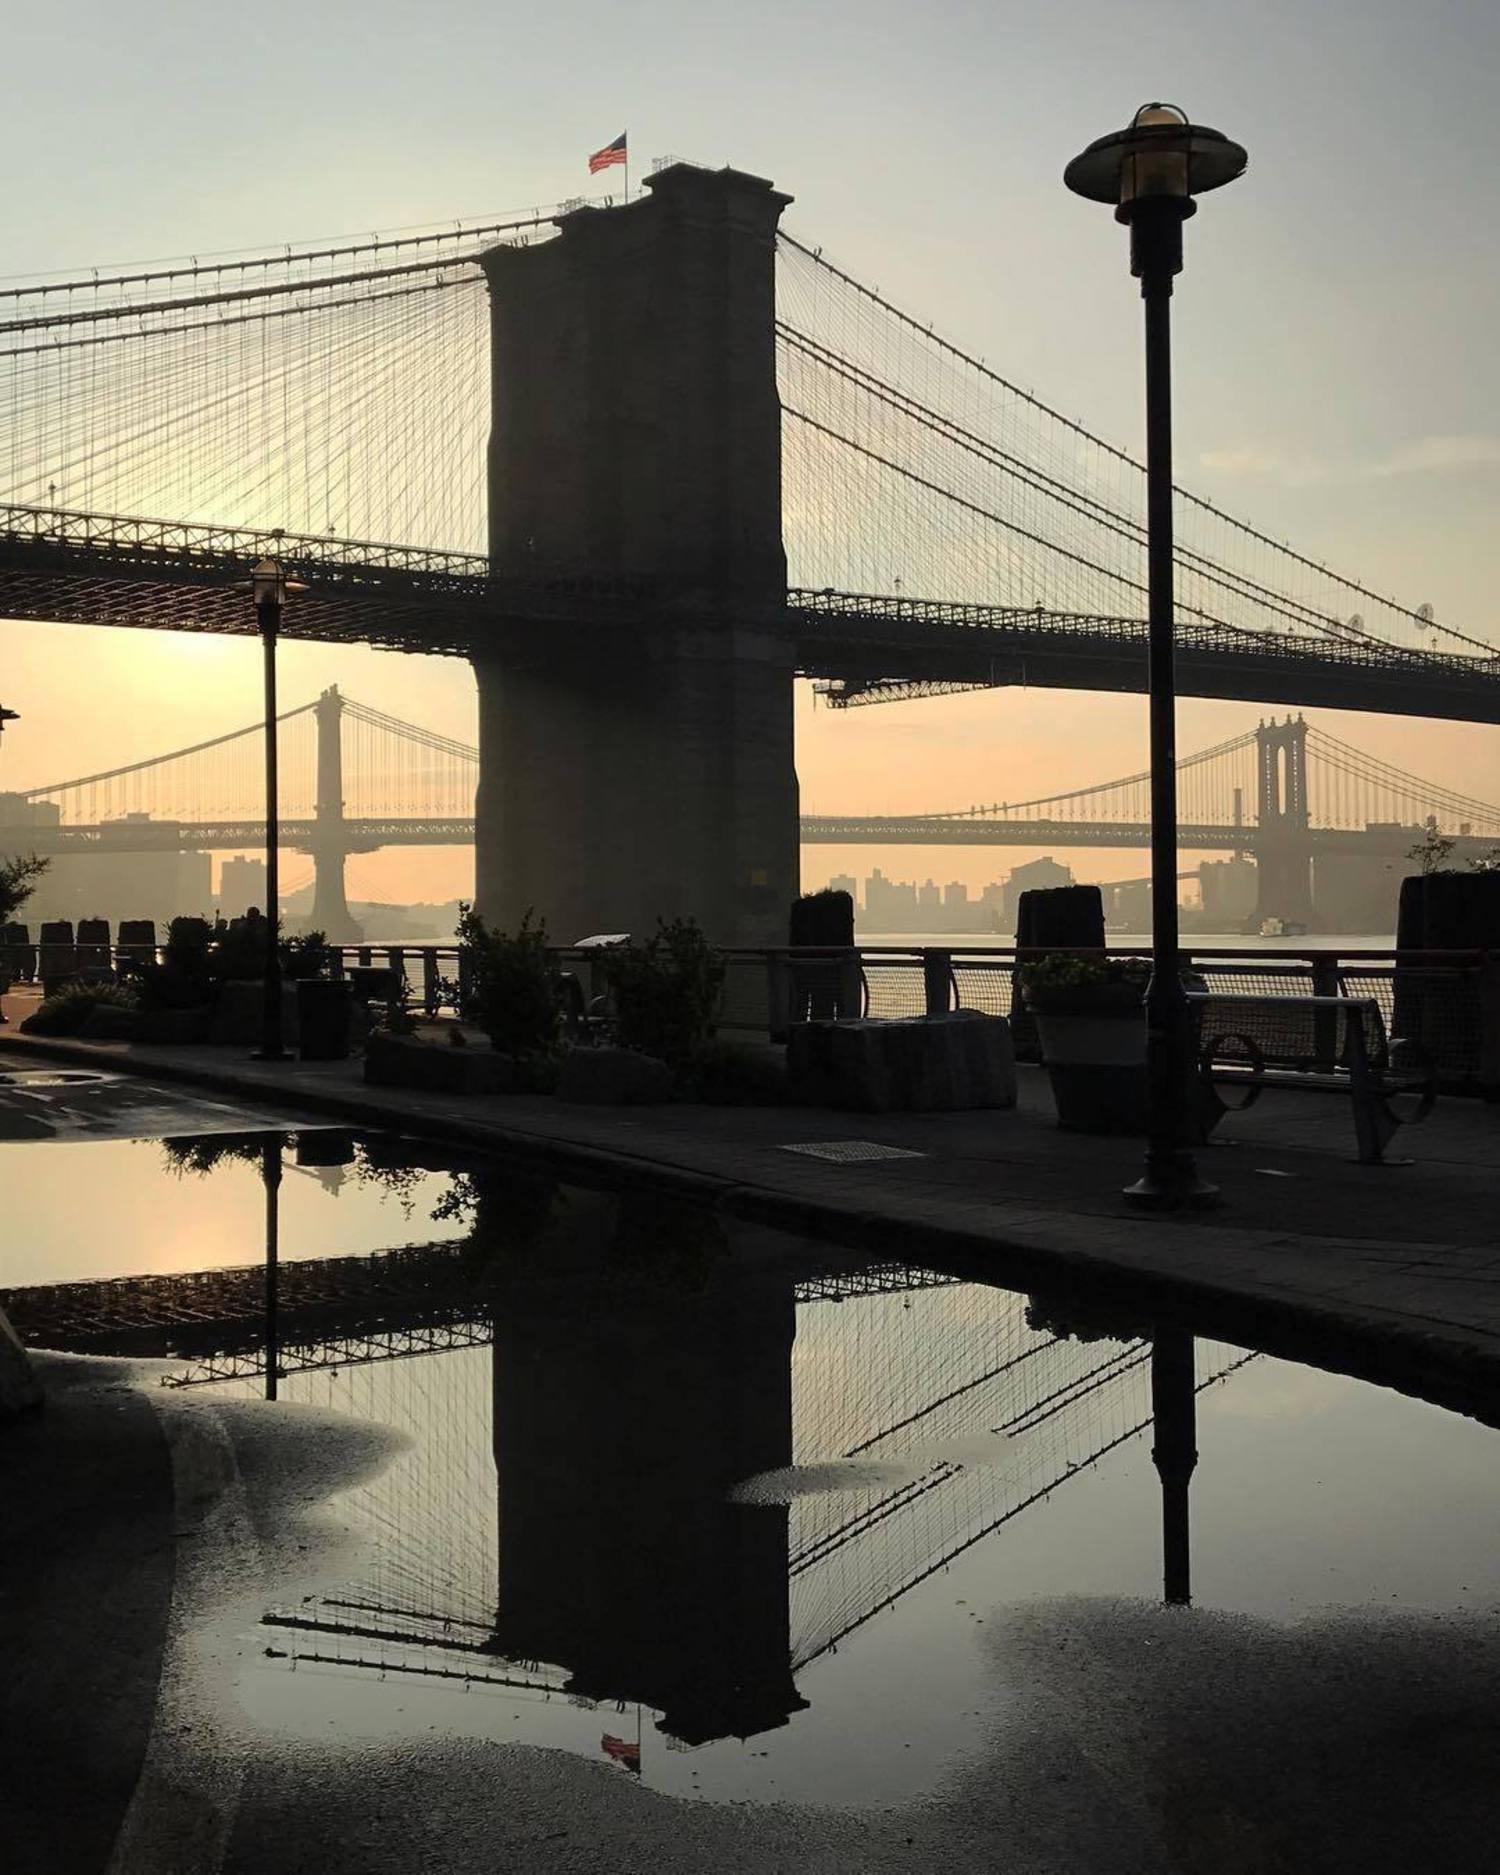 New York, New York. Photo via @bdspitz #viewingnyc #newyork #newyorkcity #nyc